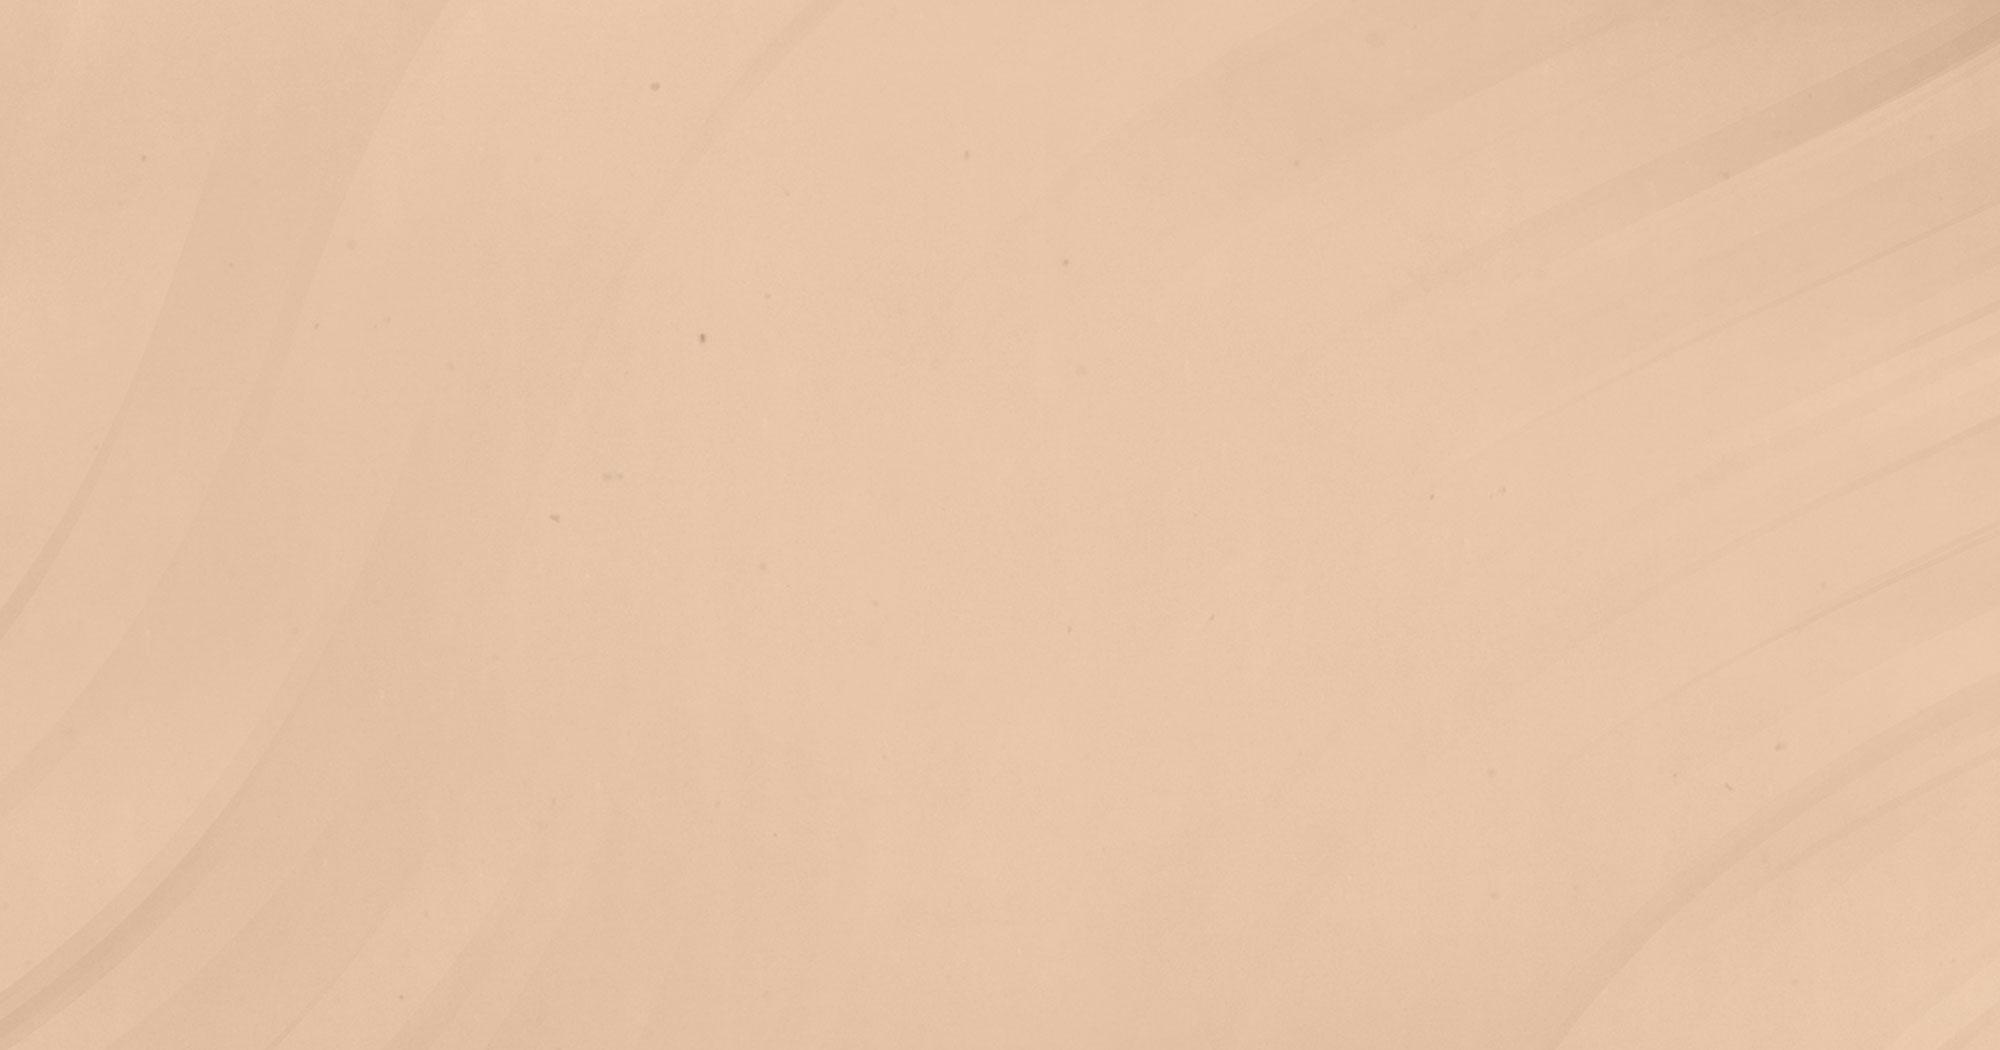 Show Pigs - Mertens Cattle Company - Milbank, South Dakota Ranch House Designs Pig on pig pool, pig bathroom, bird cage design, crate design, barn design, pig cooking, pig drawing, pig home, pig floor, bbq smoker design, silo design, pig door, pig sofa, pig painting, pig lamps, pig fabric, pig shelter, poultry farm design, pig accessories, pig food,